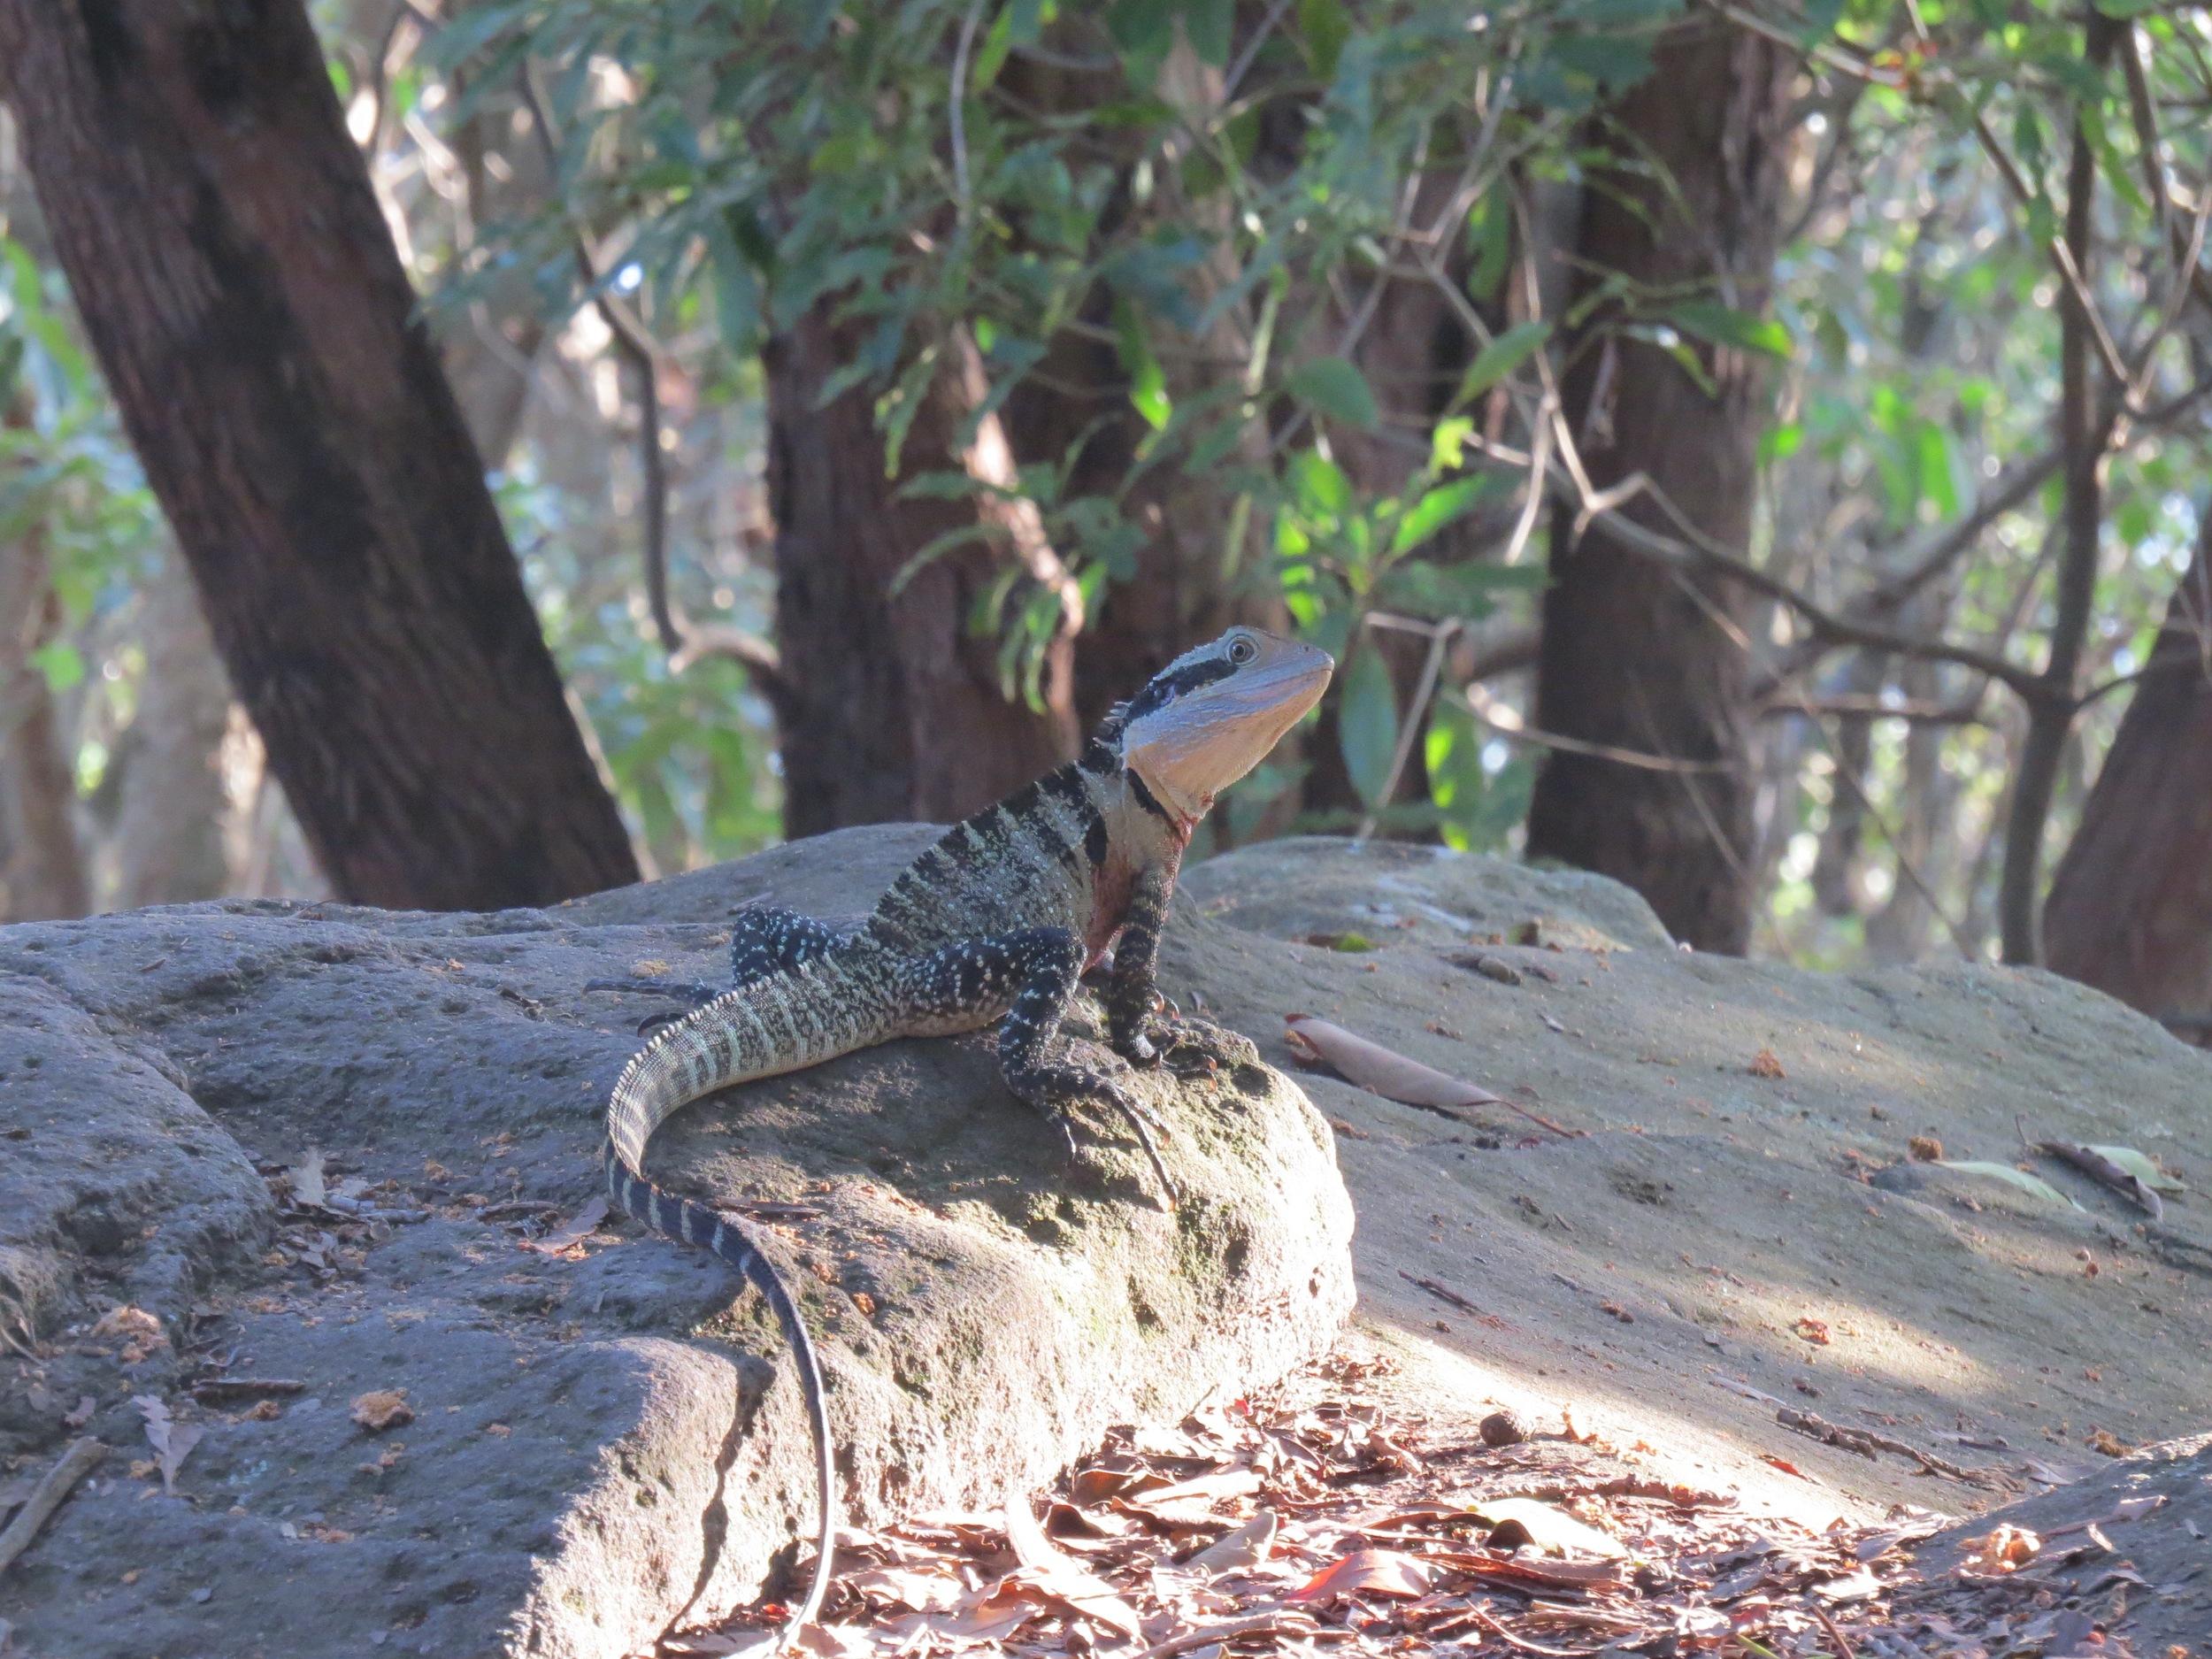 Bearded Dragon, Sirius Cove, Australia